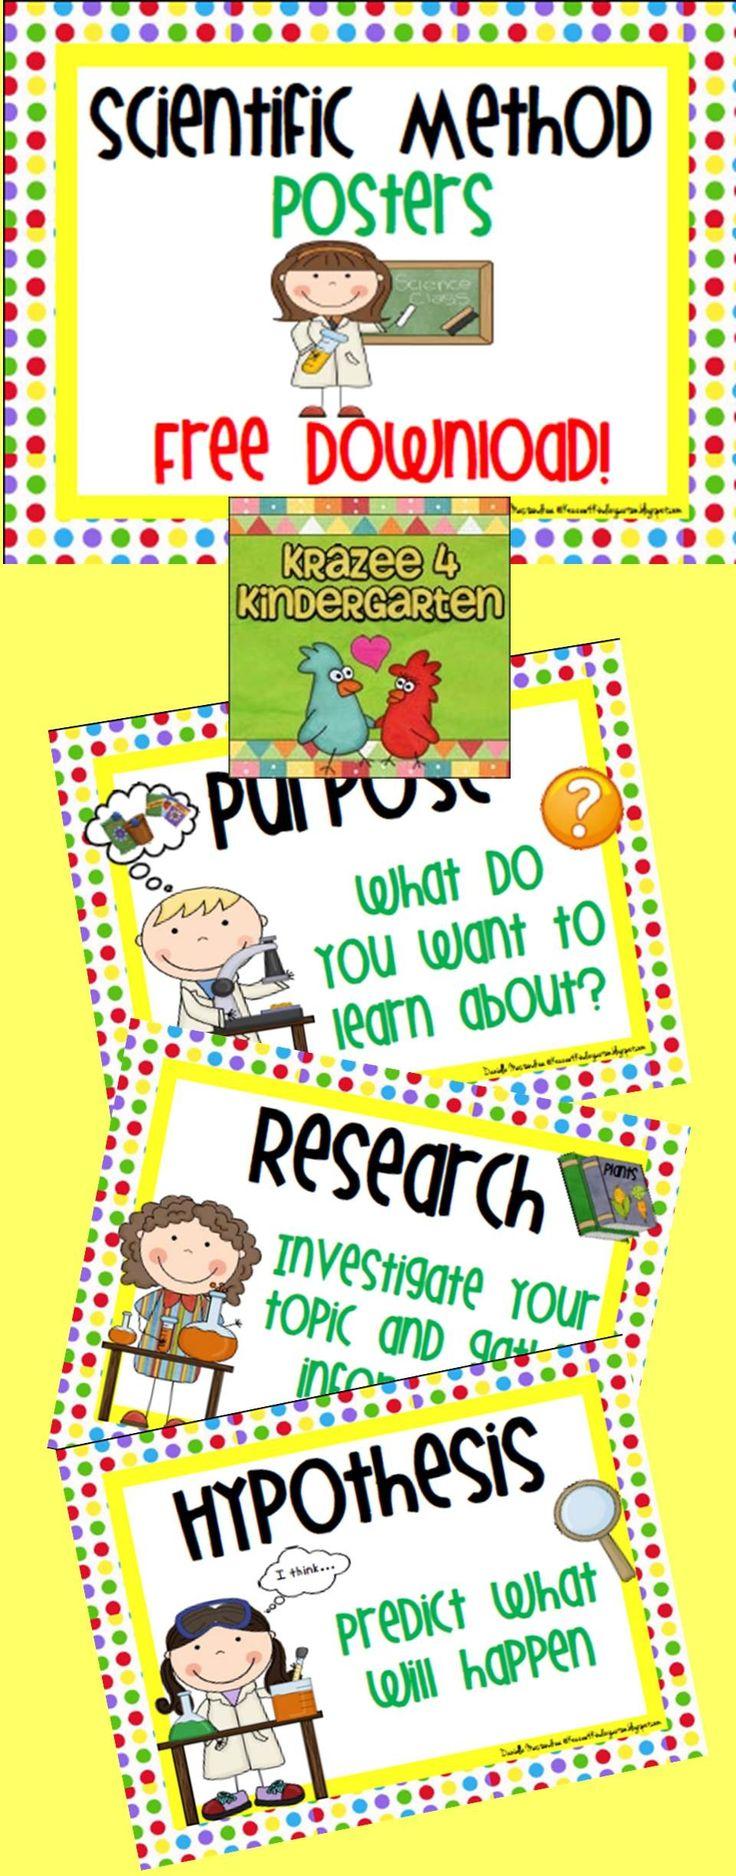 Scientific Method Posters- Free